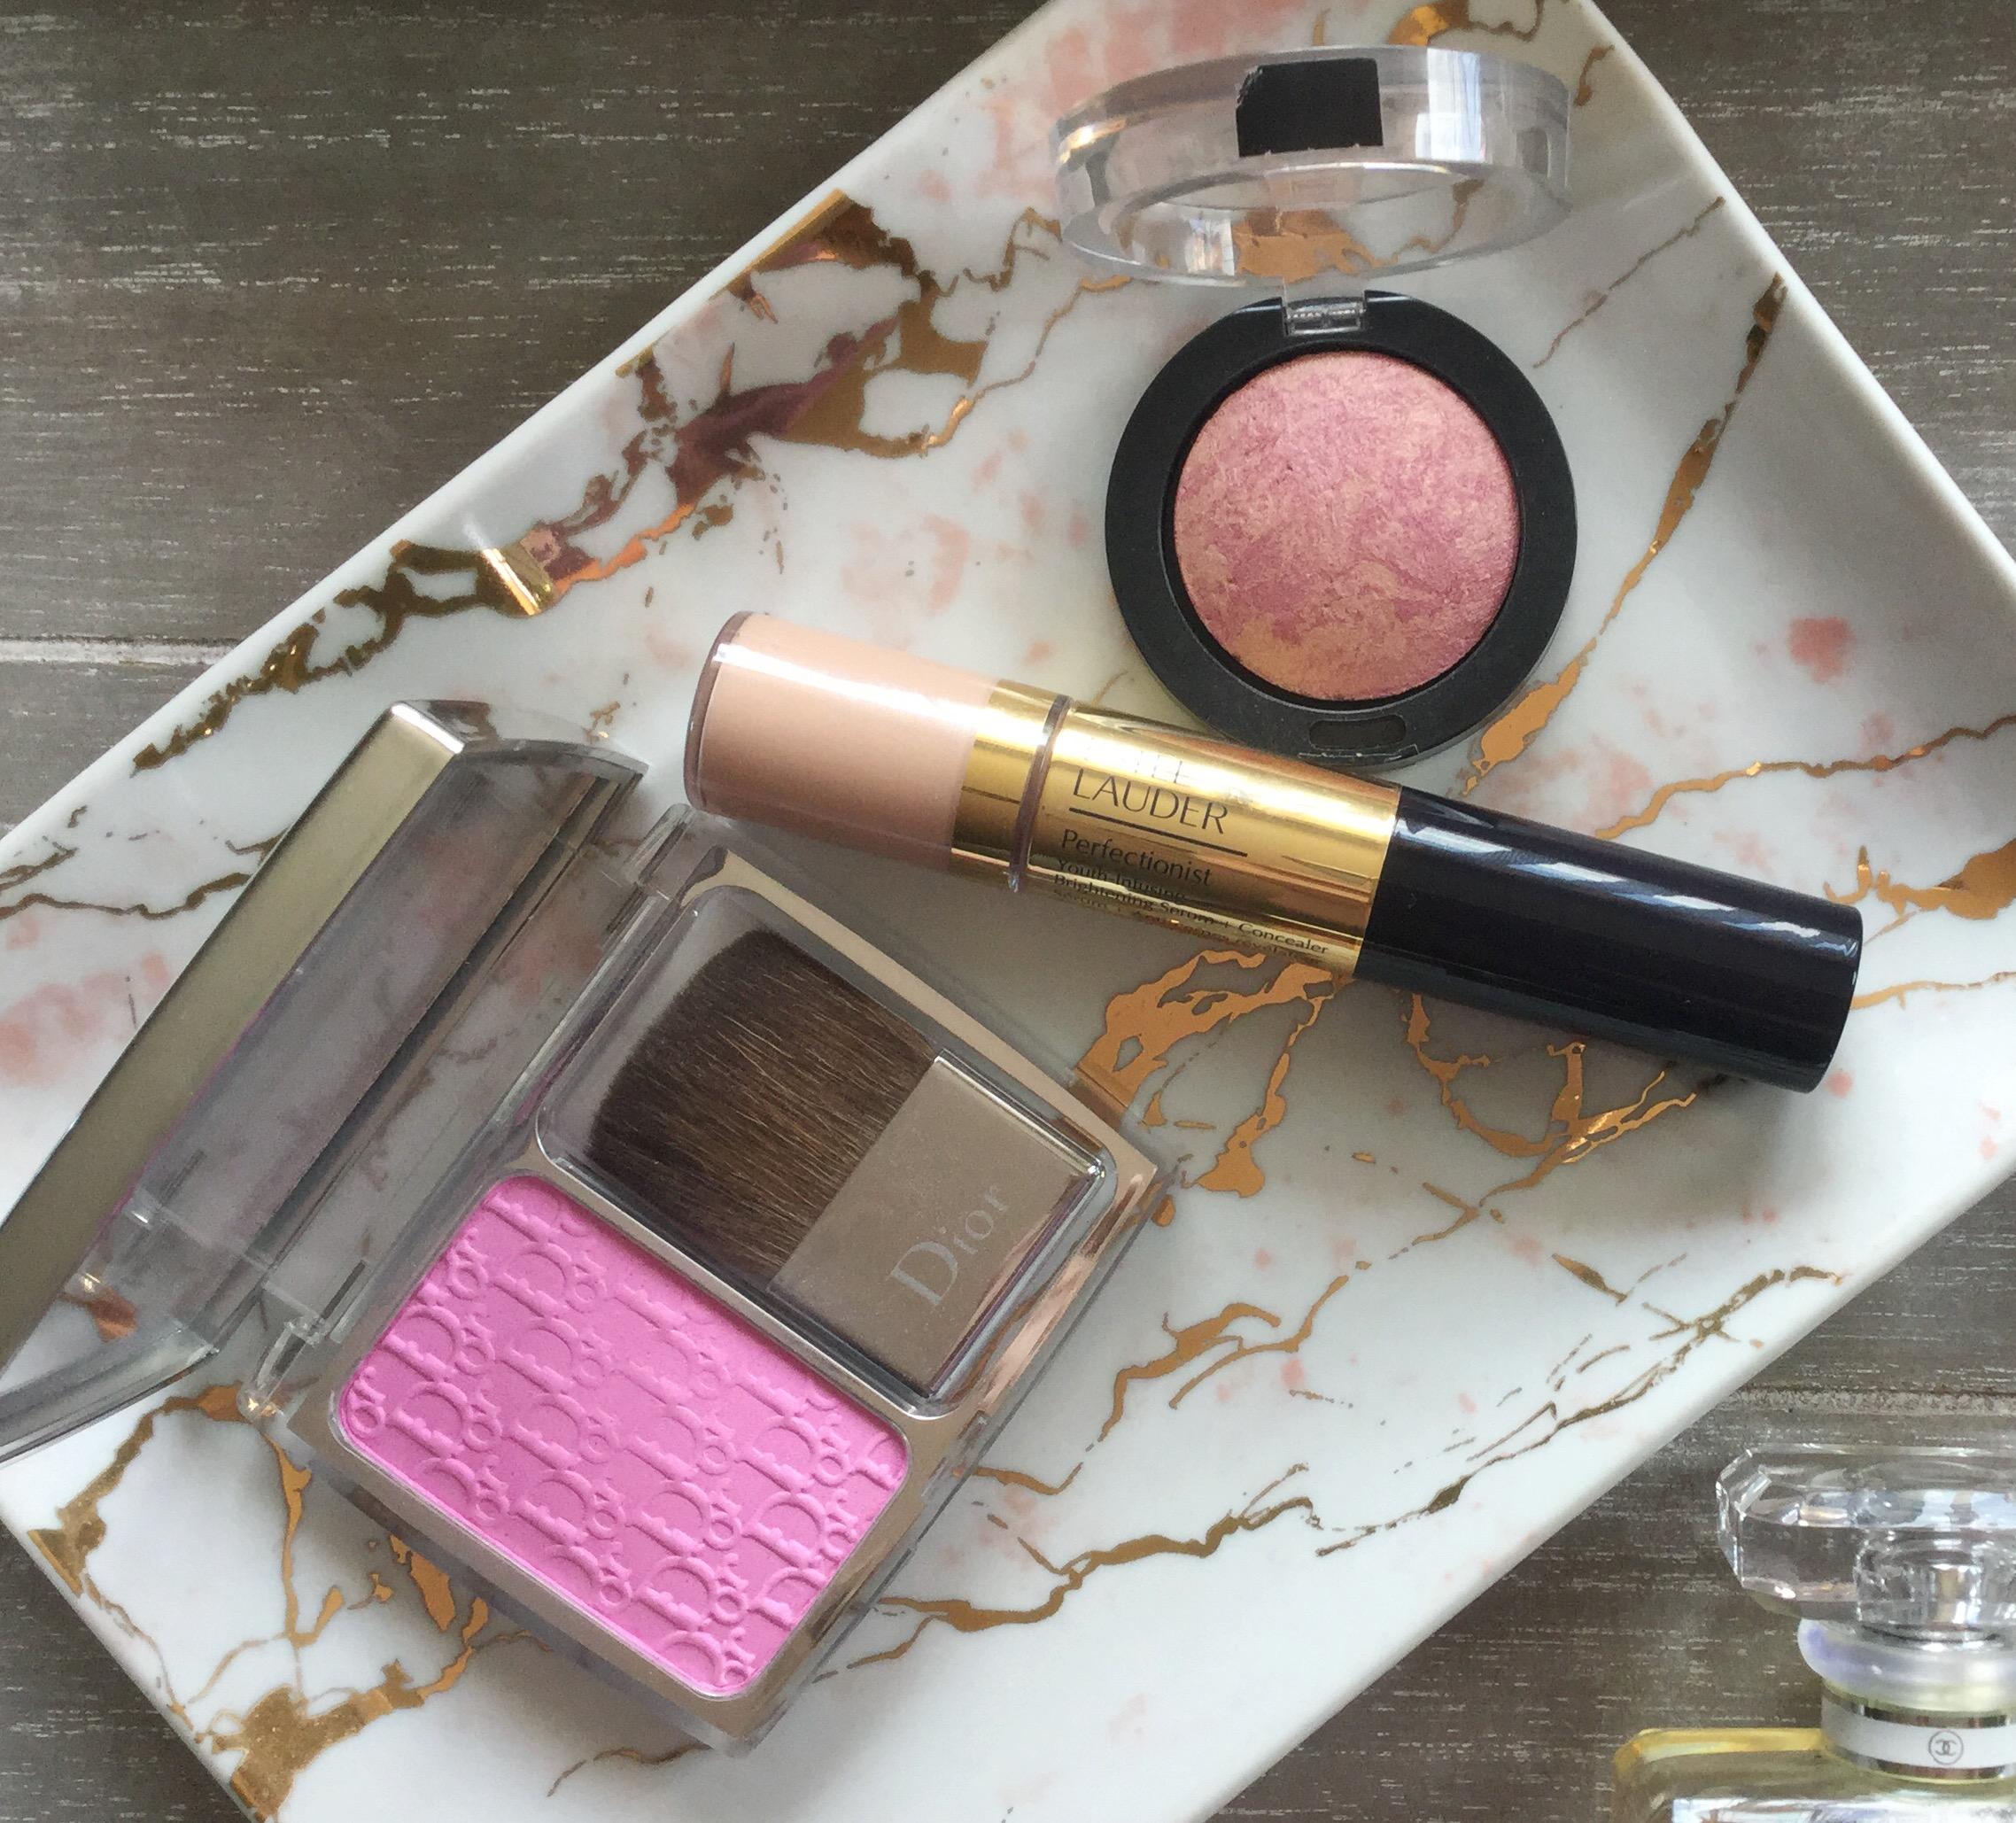 Dior Rosy Glow, Estée Lauder Perfectionist Serum & Concealer, Max Factor Creme Puff Blush Seductive Pink